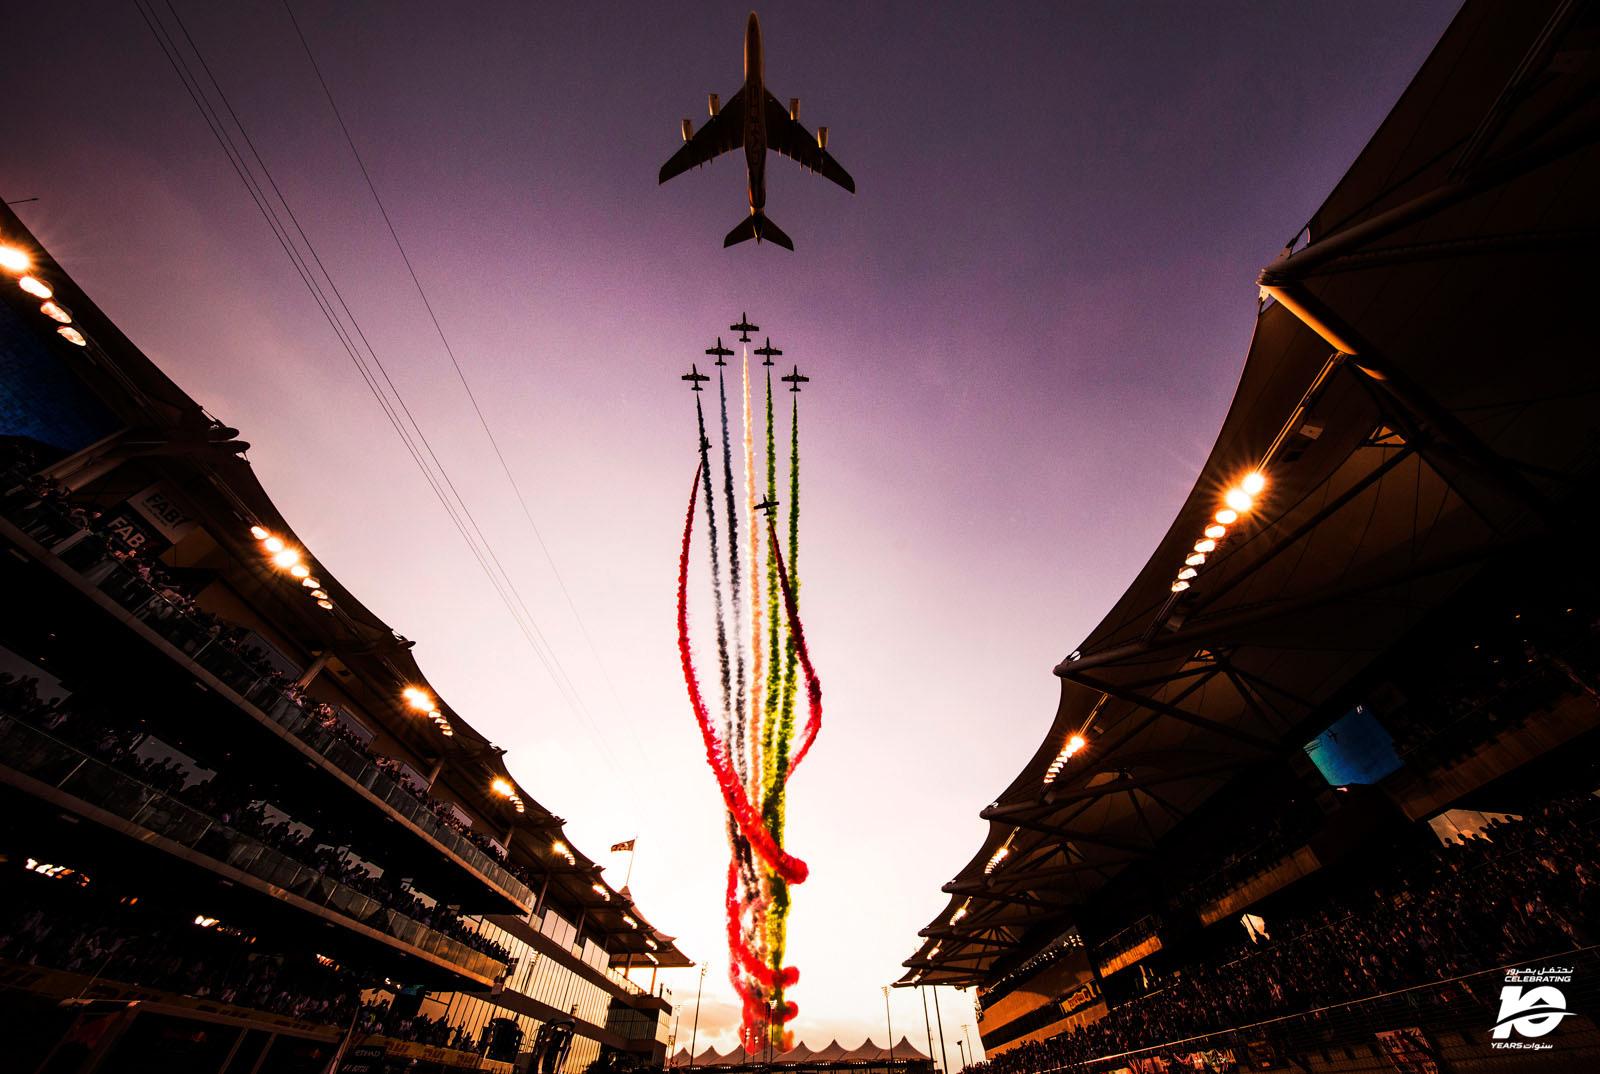 9.Fly_Past_Abu_Dhabi'17_014_.jpg